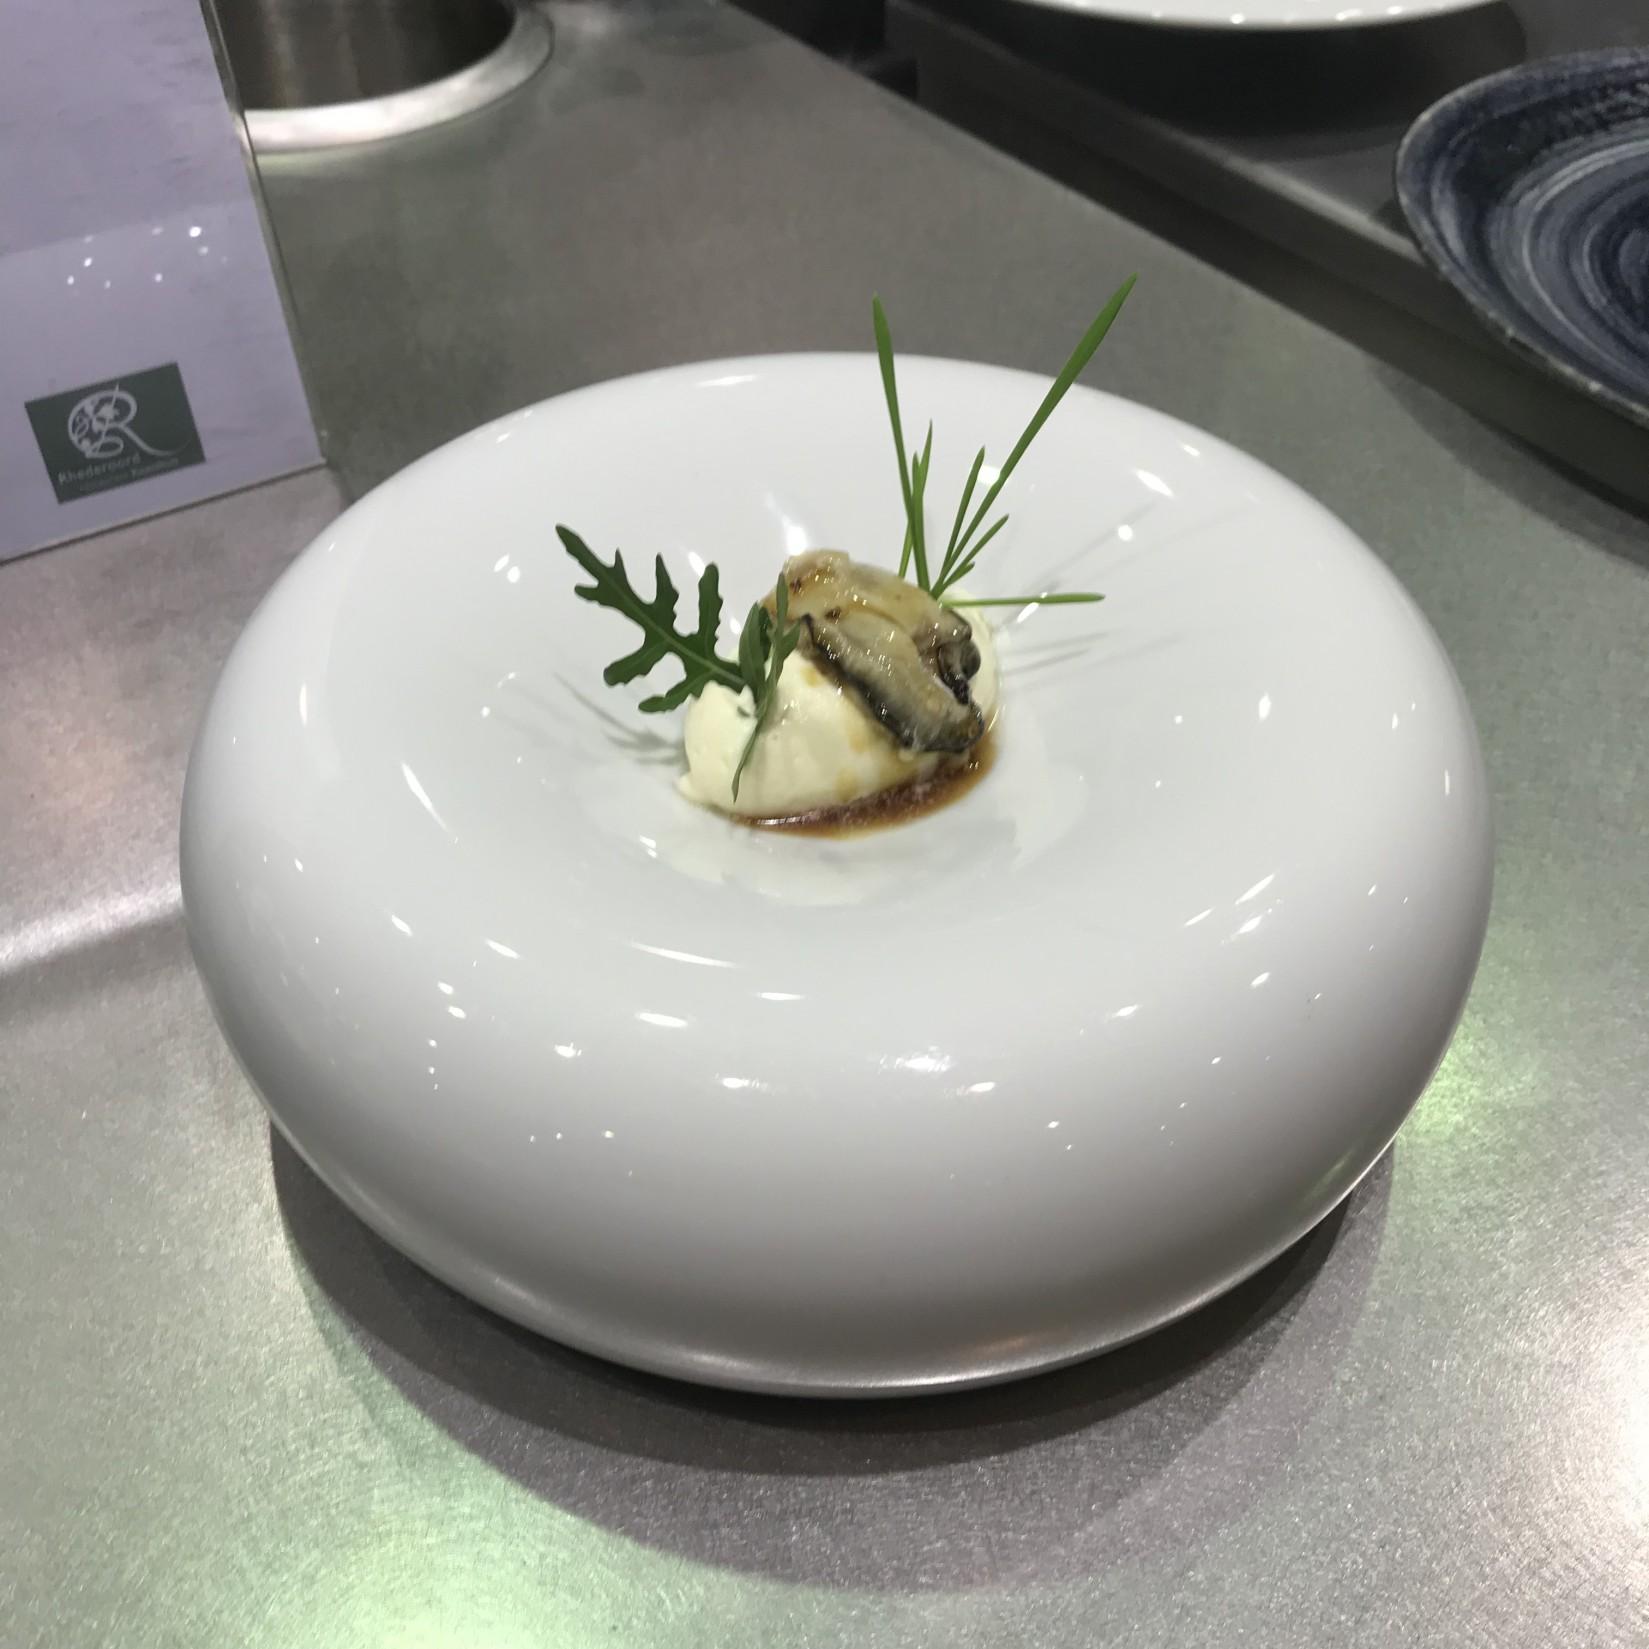 Aardappelmousse met oesters